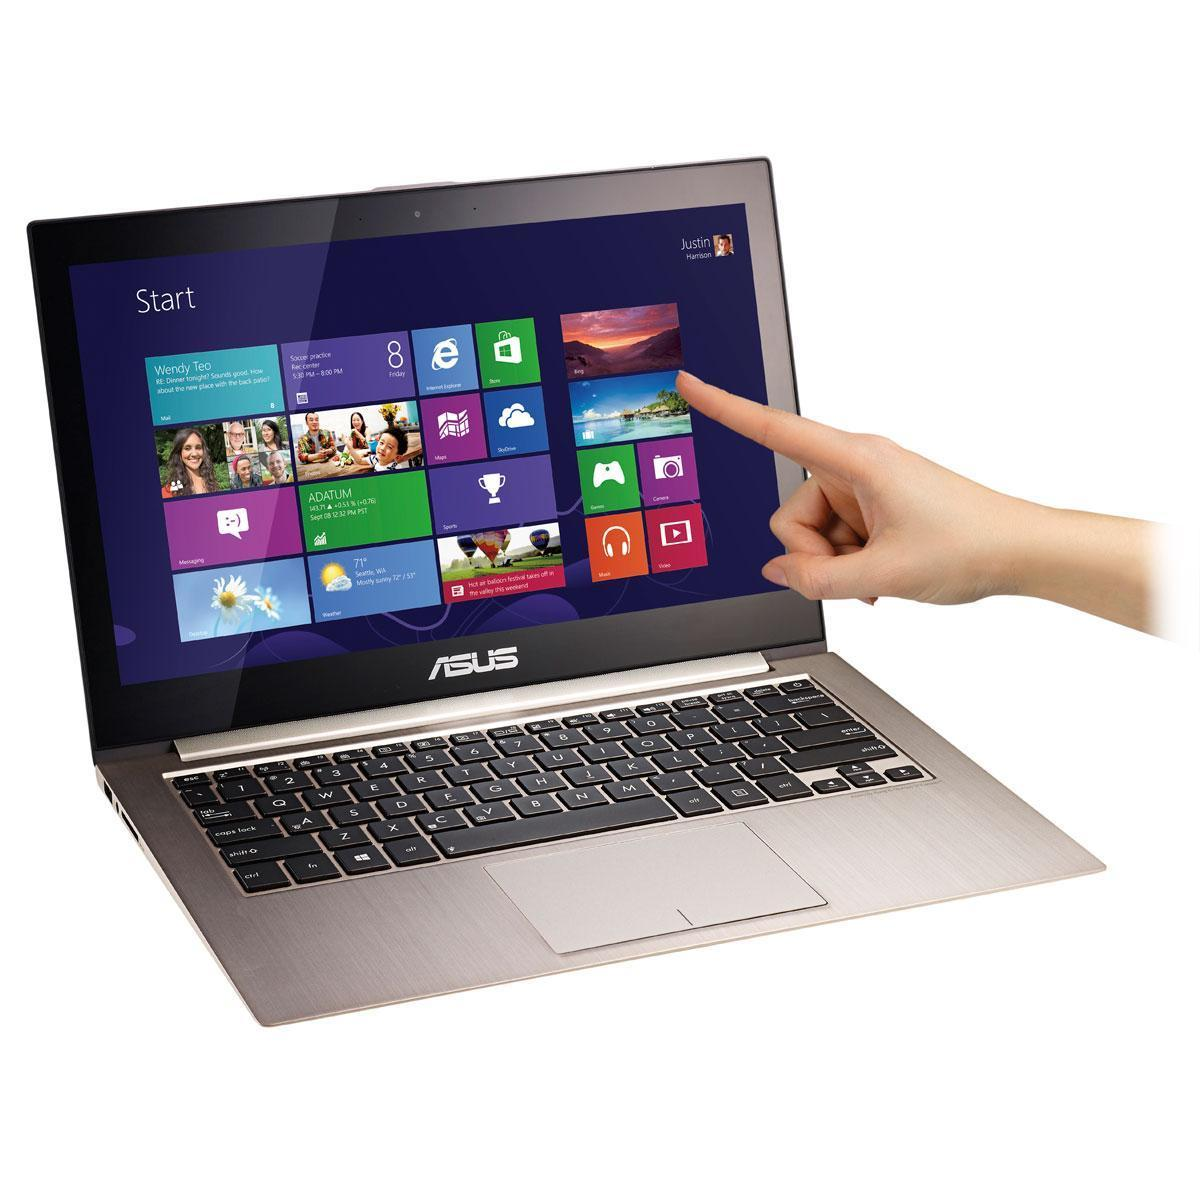 Asus UX31A-C4027H - Intel Core i7 3517U 1.9  GHz -  256 Go - RAM 4 Go Go